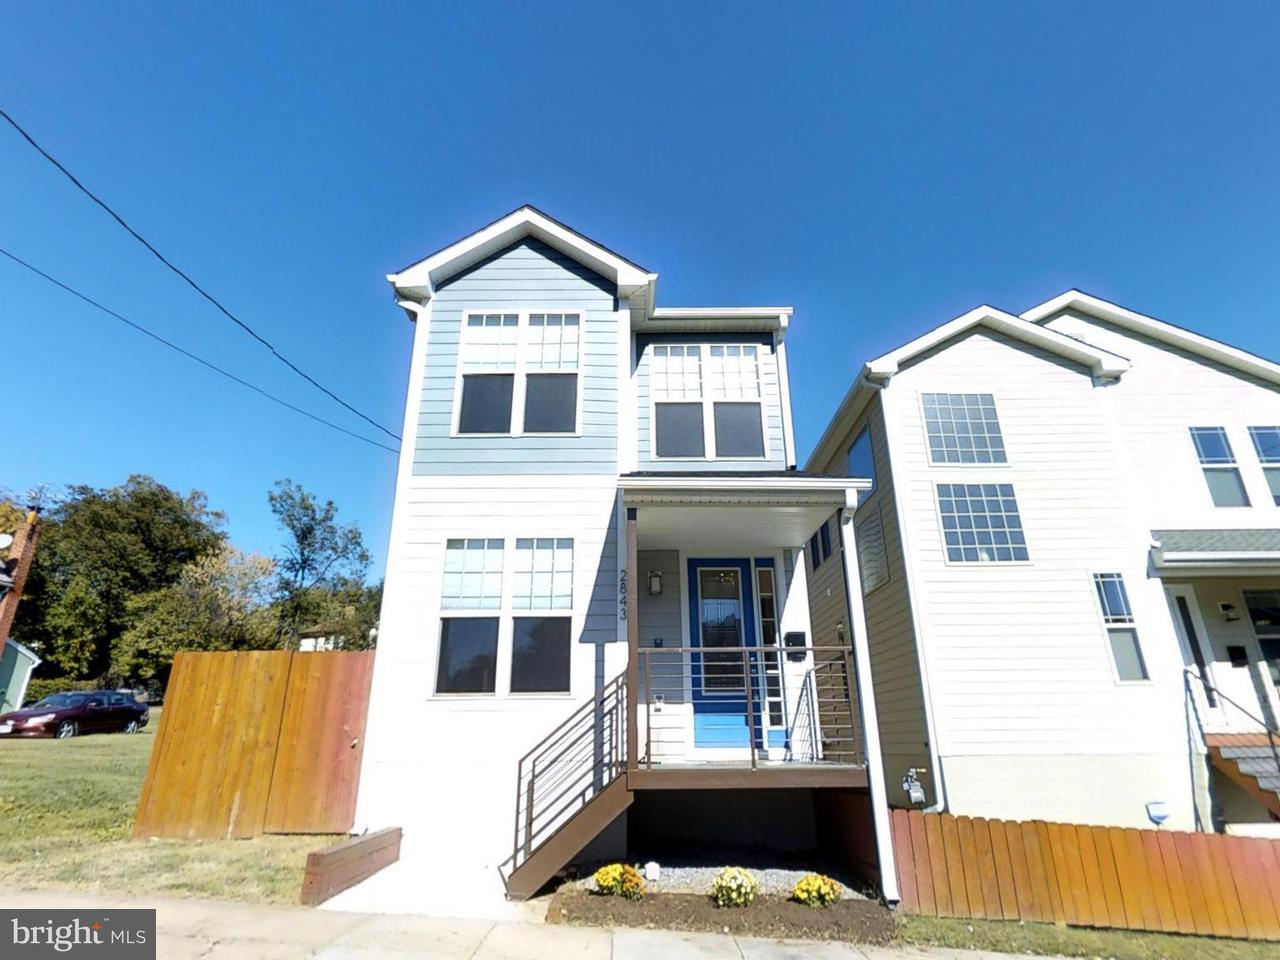 Single Family Home for Sale at 2843 BELAIR PL NE 2843 BELAIR PL NE Washington, District Of Columbia 20018 United States